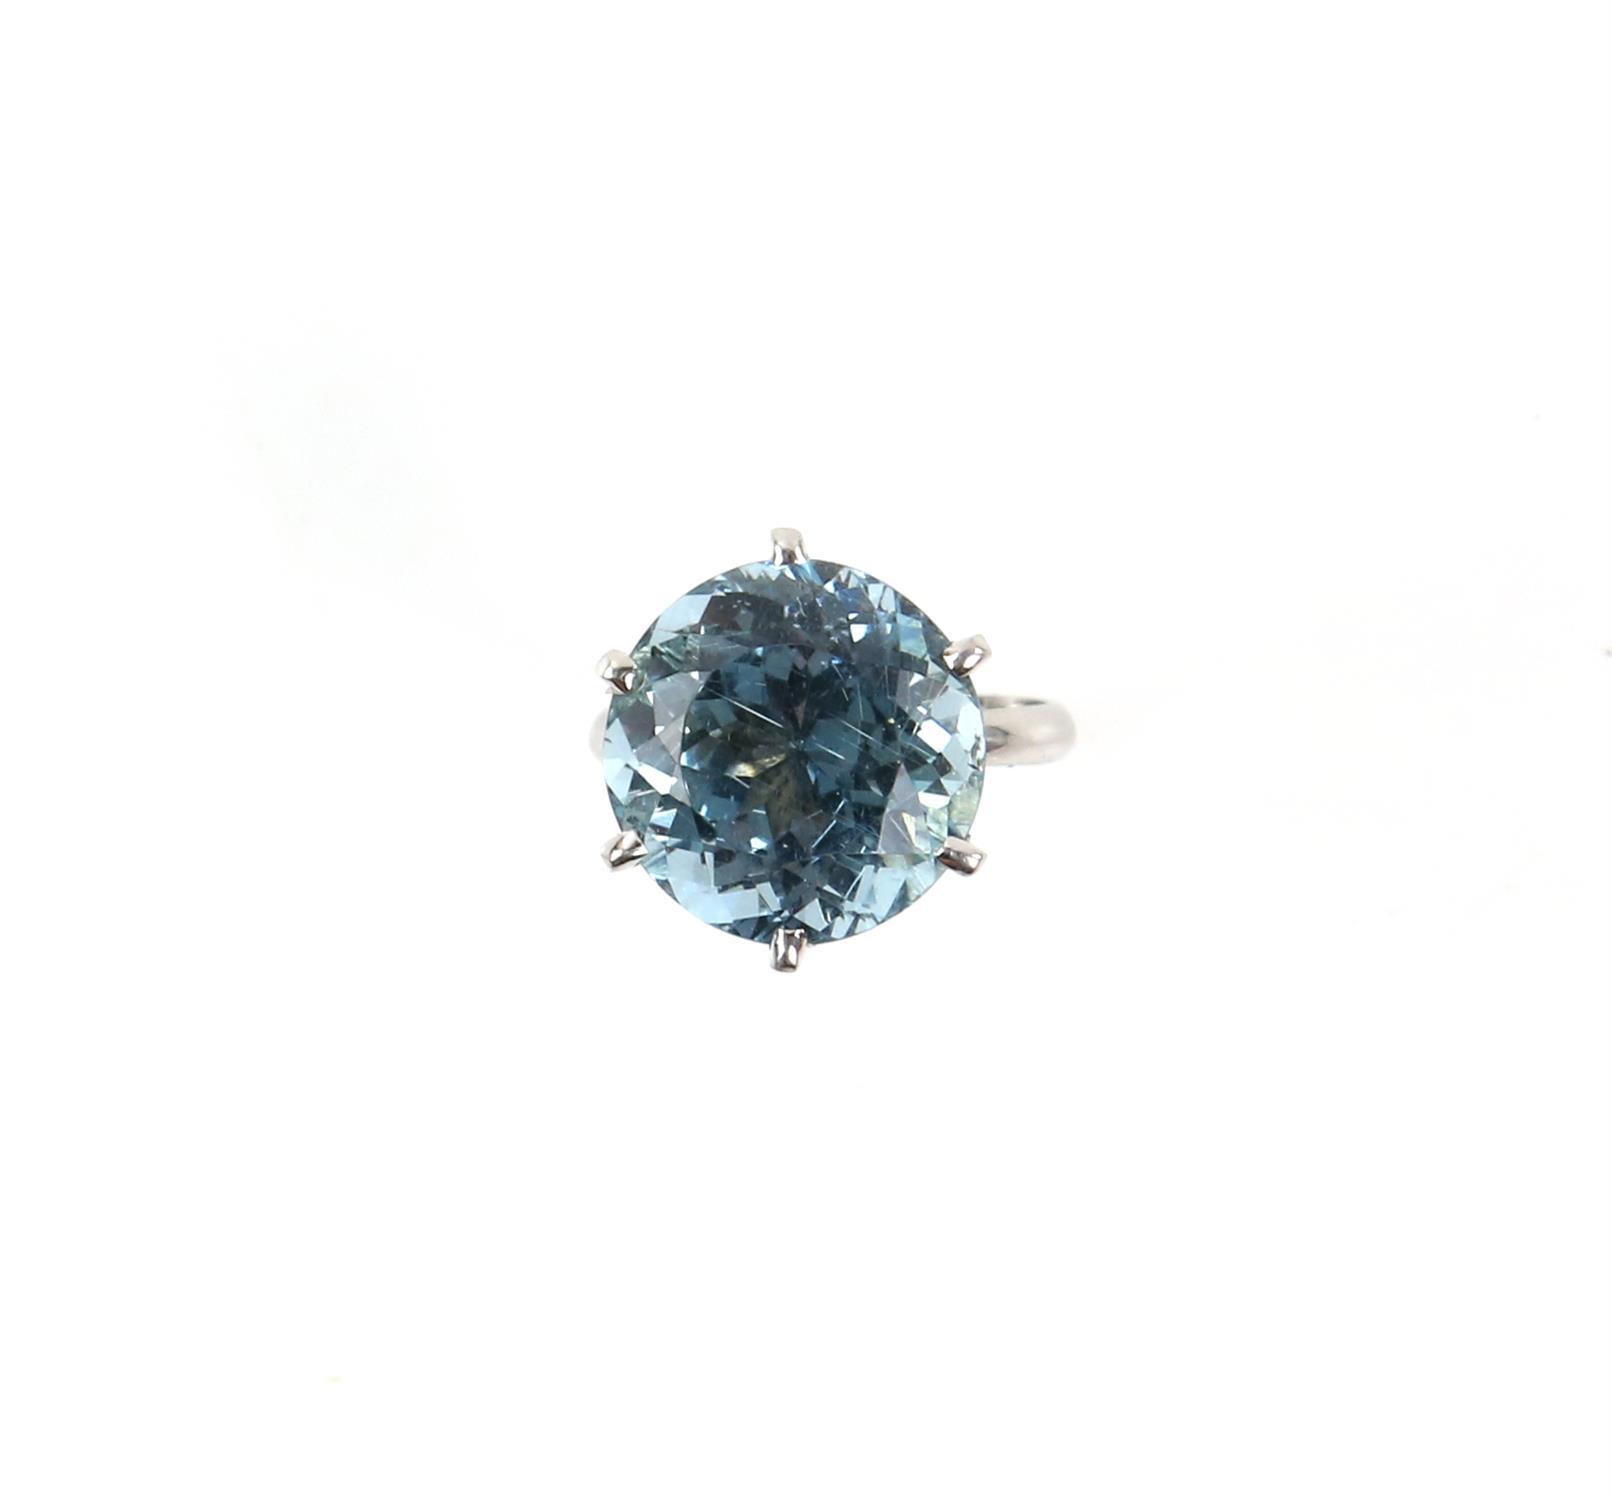 Aquamarine ring, round cut aquamarine, estimated weight 8.80 carats, mount testing as 18 ct,